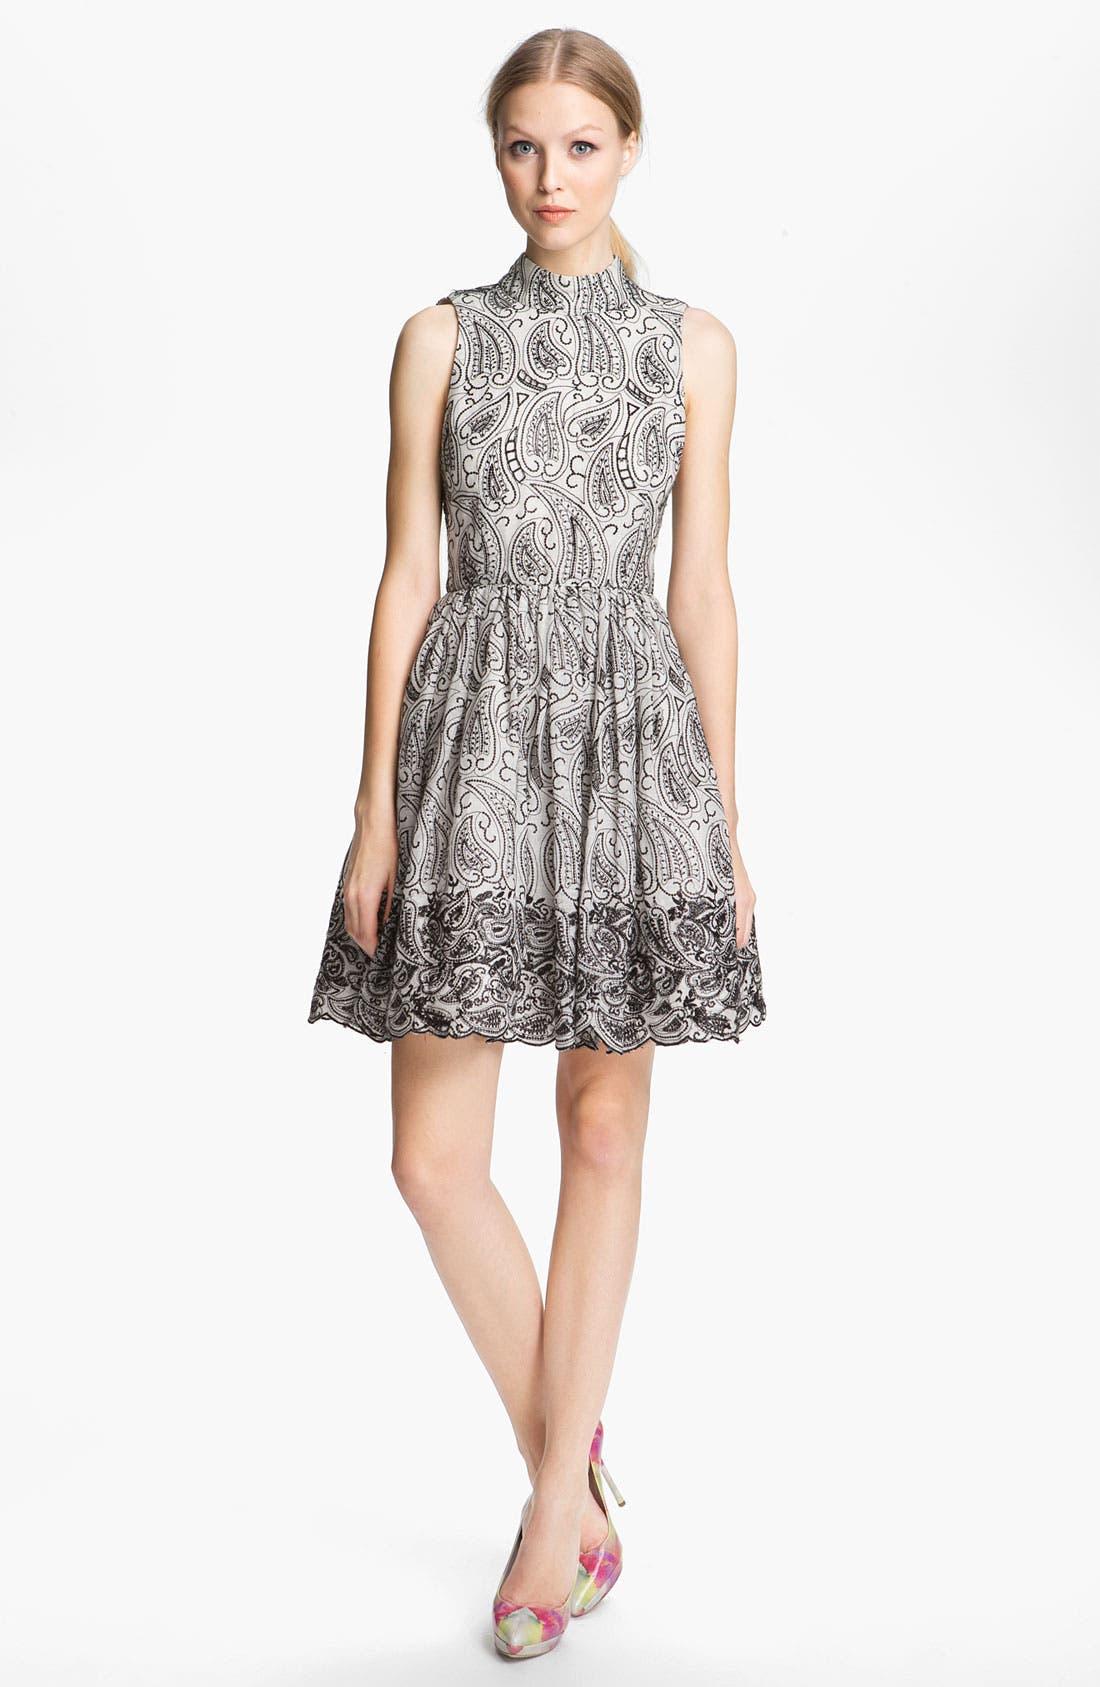 Alternate Image 1 Selected - Alice + Olivia Paisley Print Flared Dress